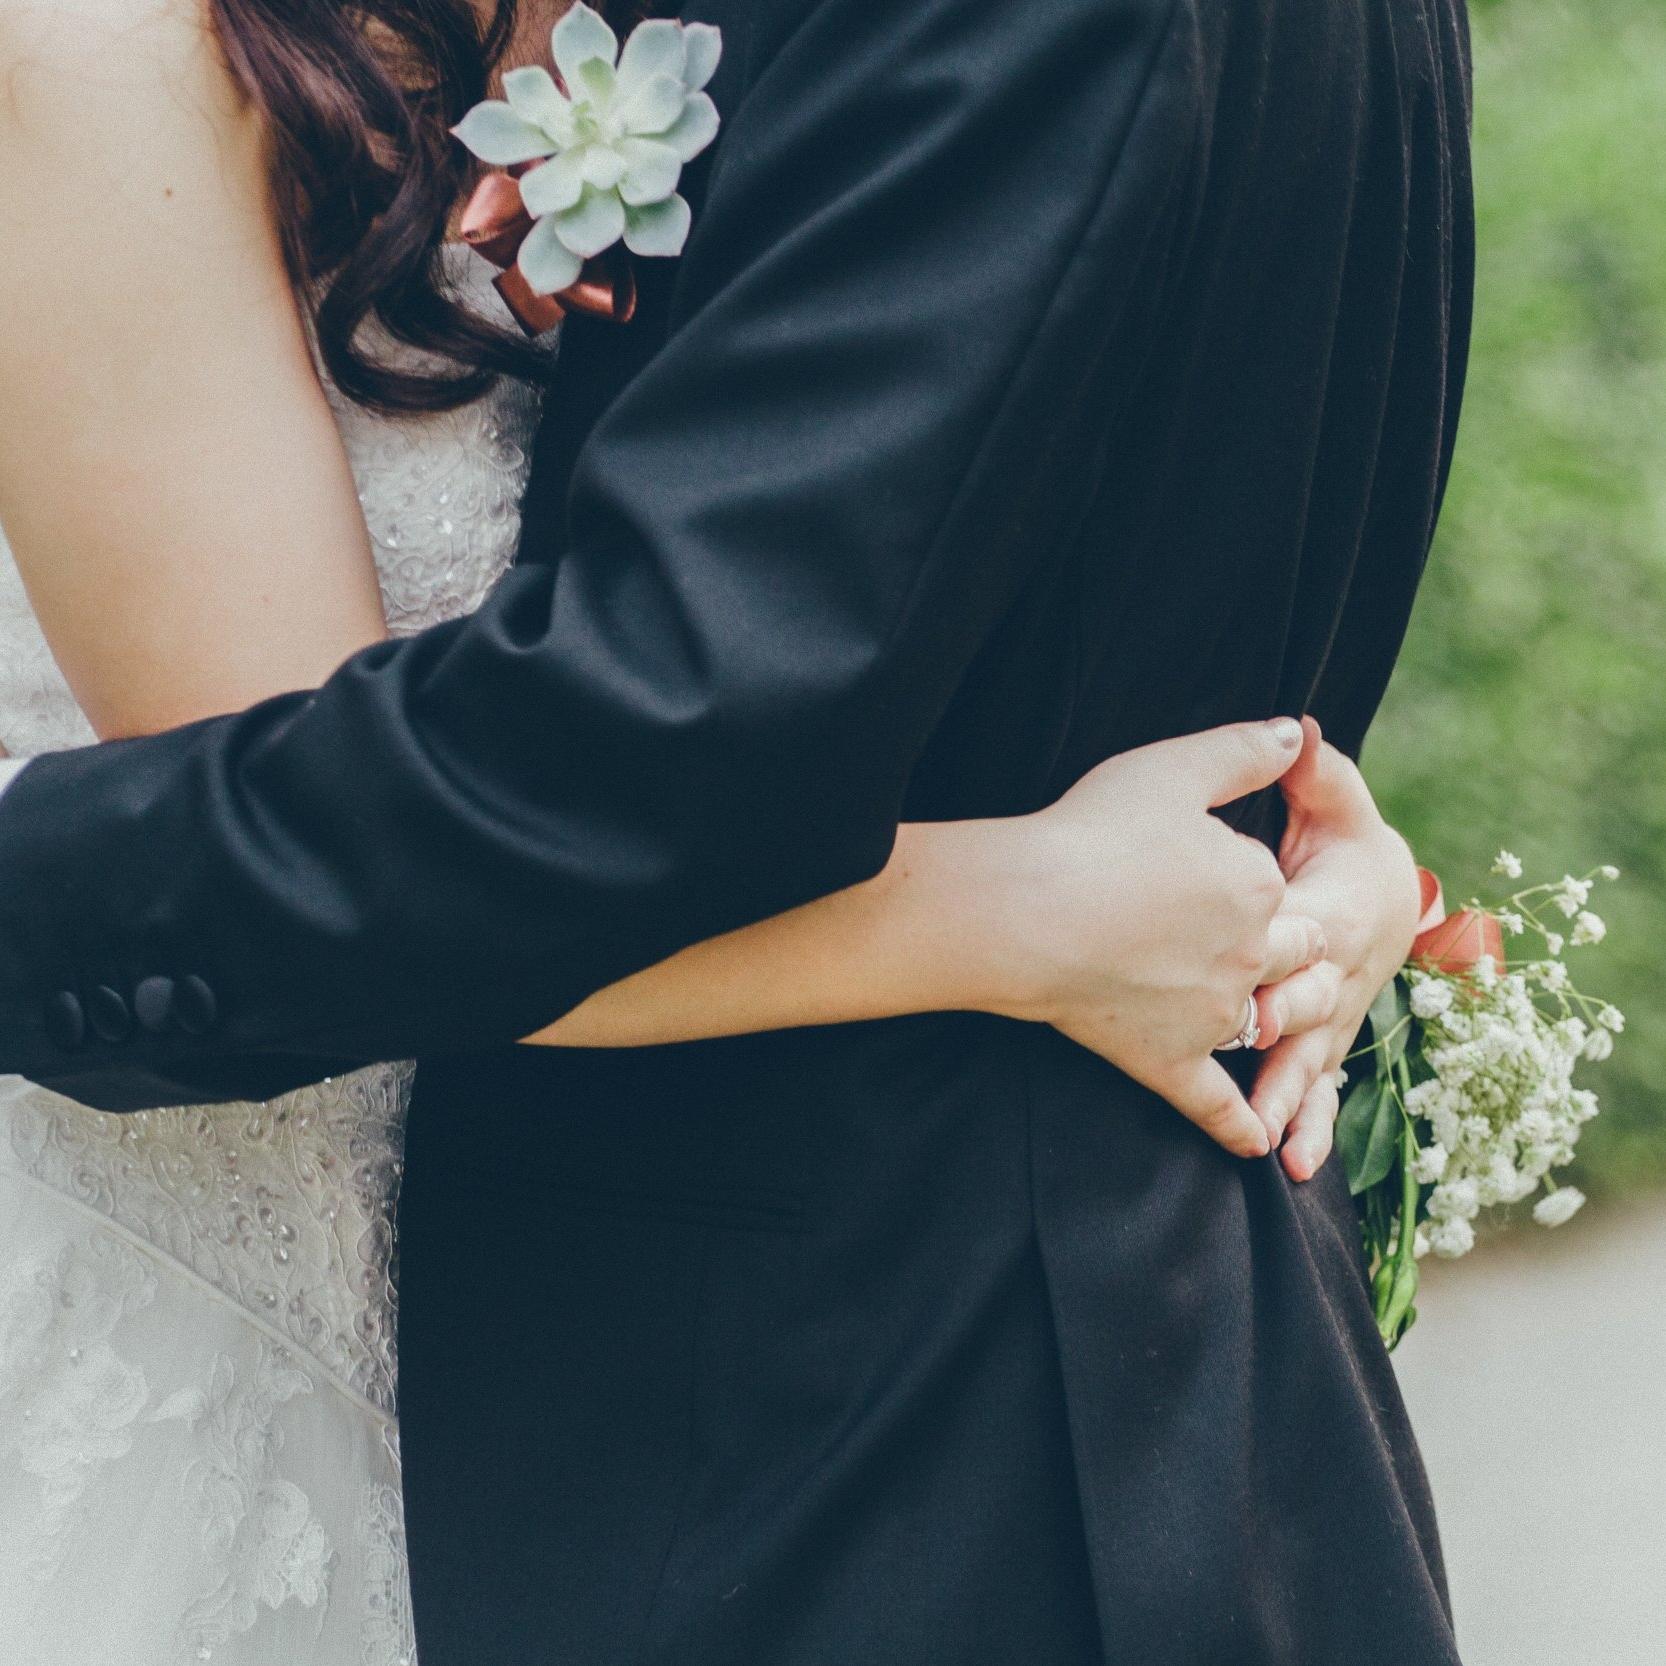 affection-blur-bridal-1023233.jpg